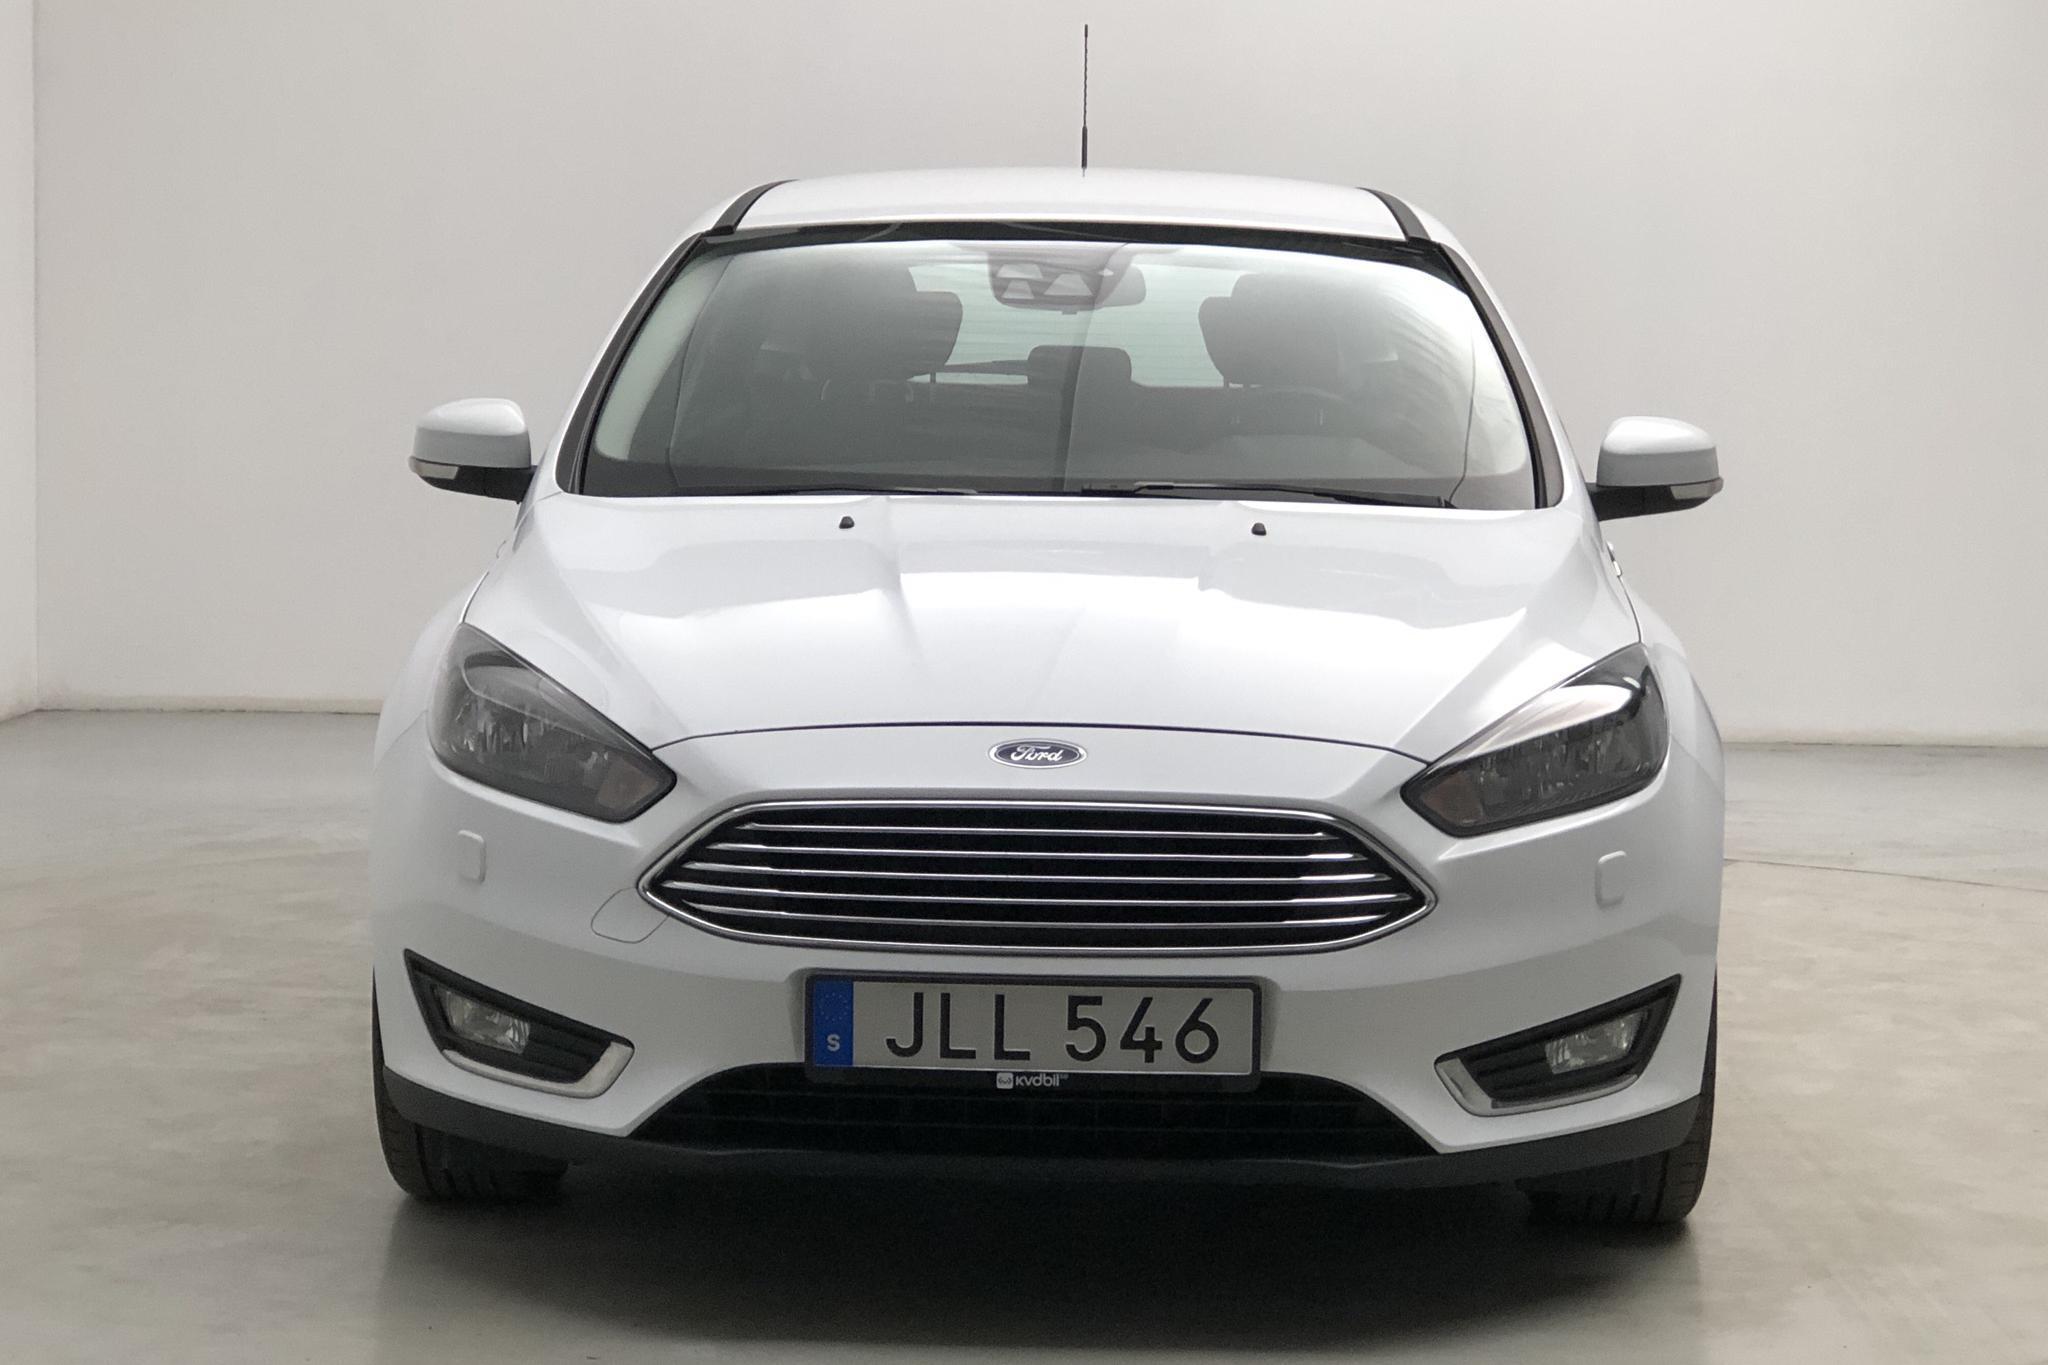 Ford Focus 1.0 EcoBoost Kombi (125hk) - 63 260 km - Automatic - white - 2016